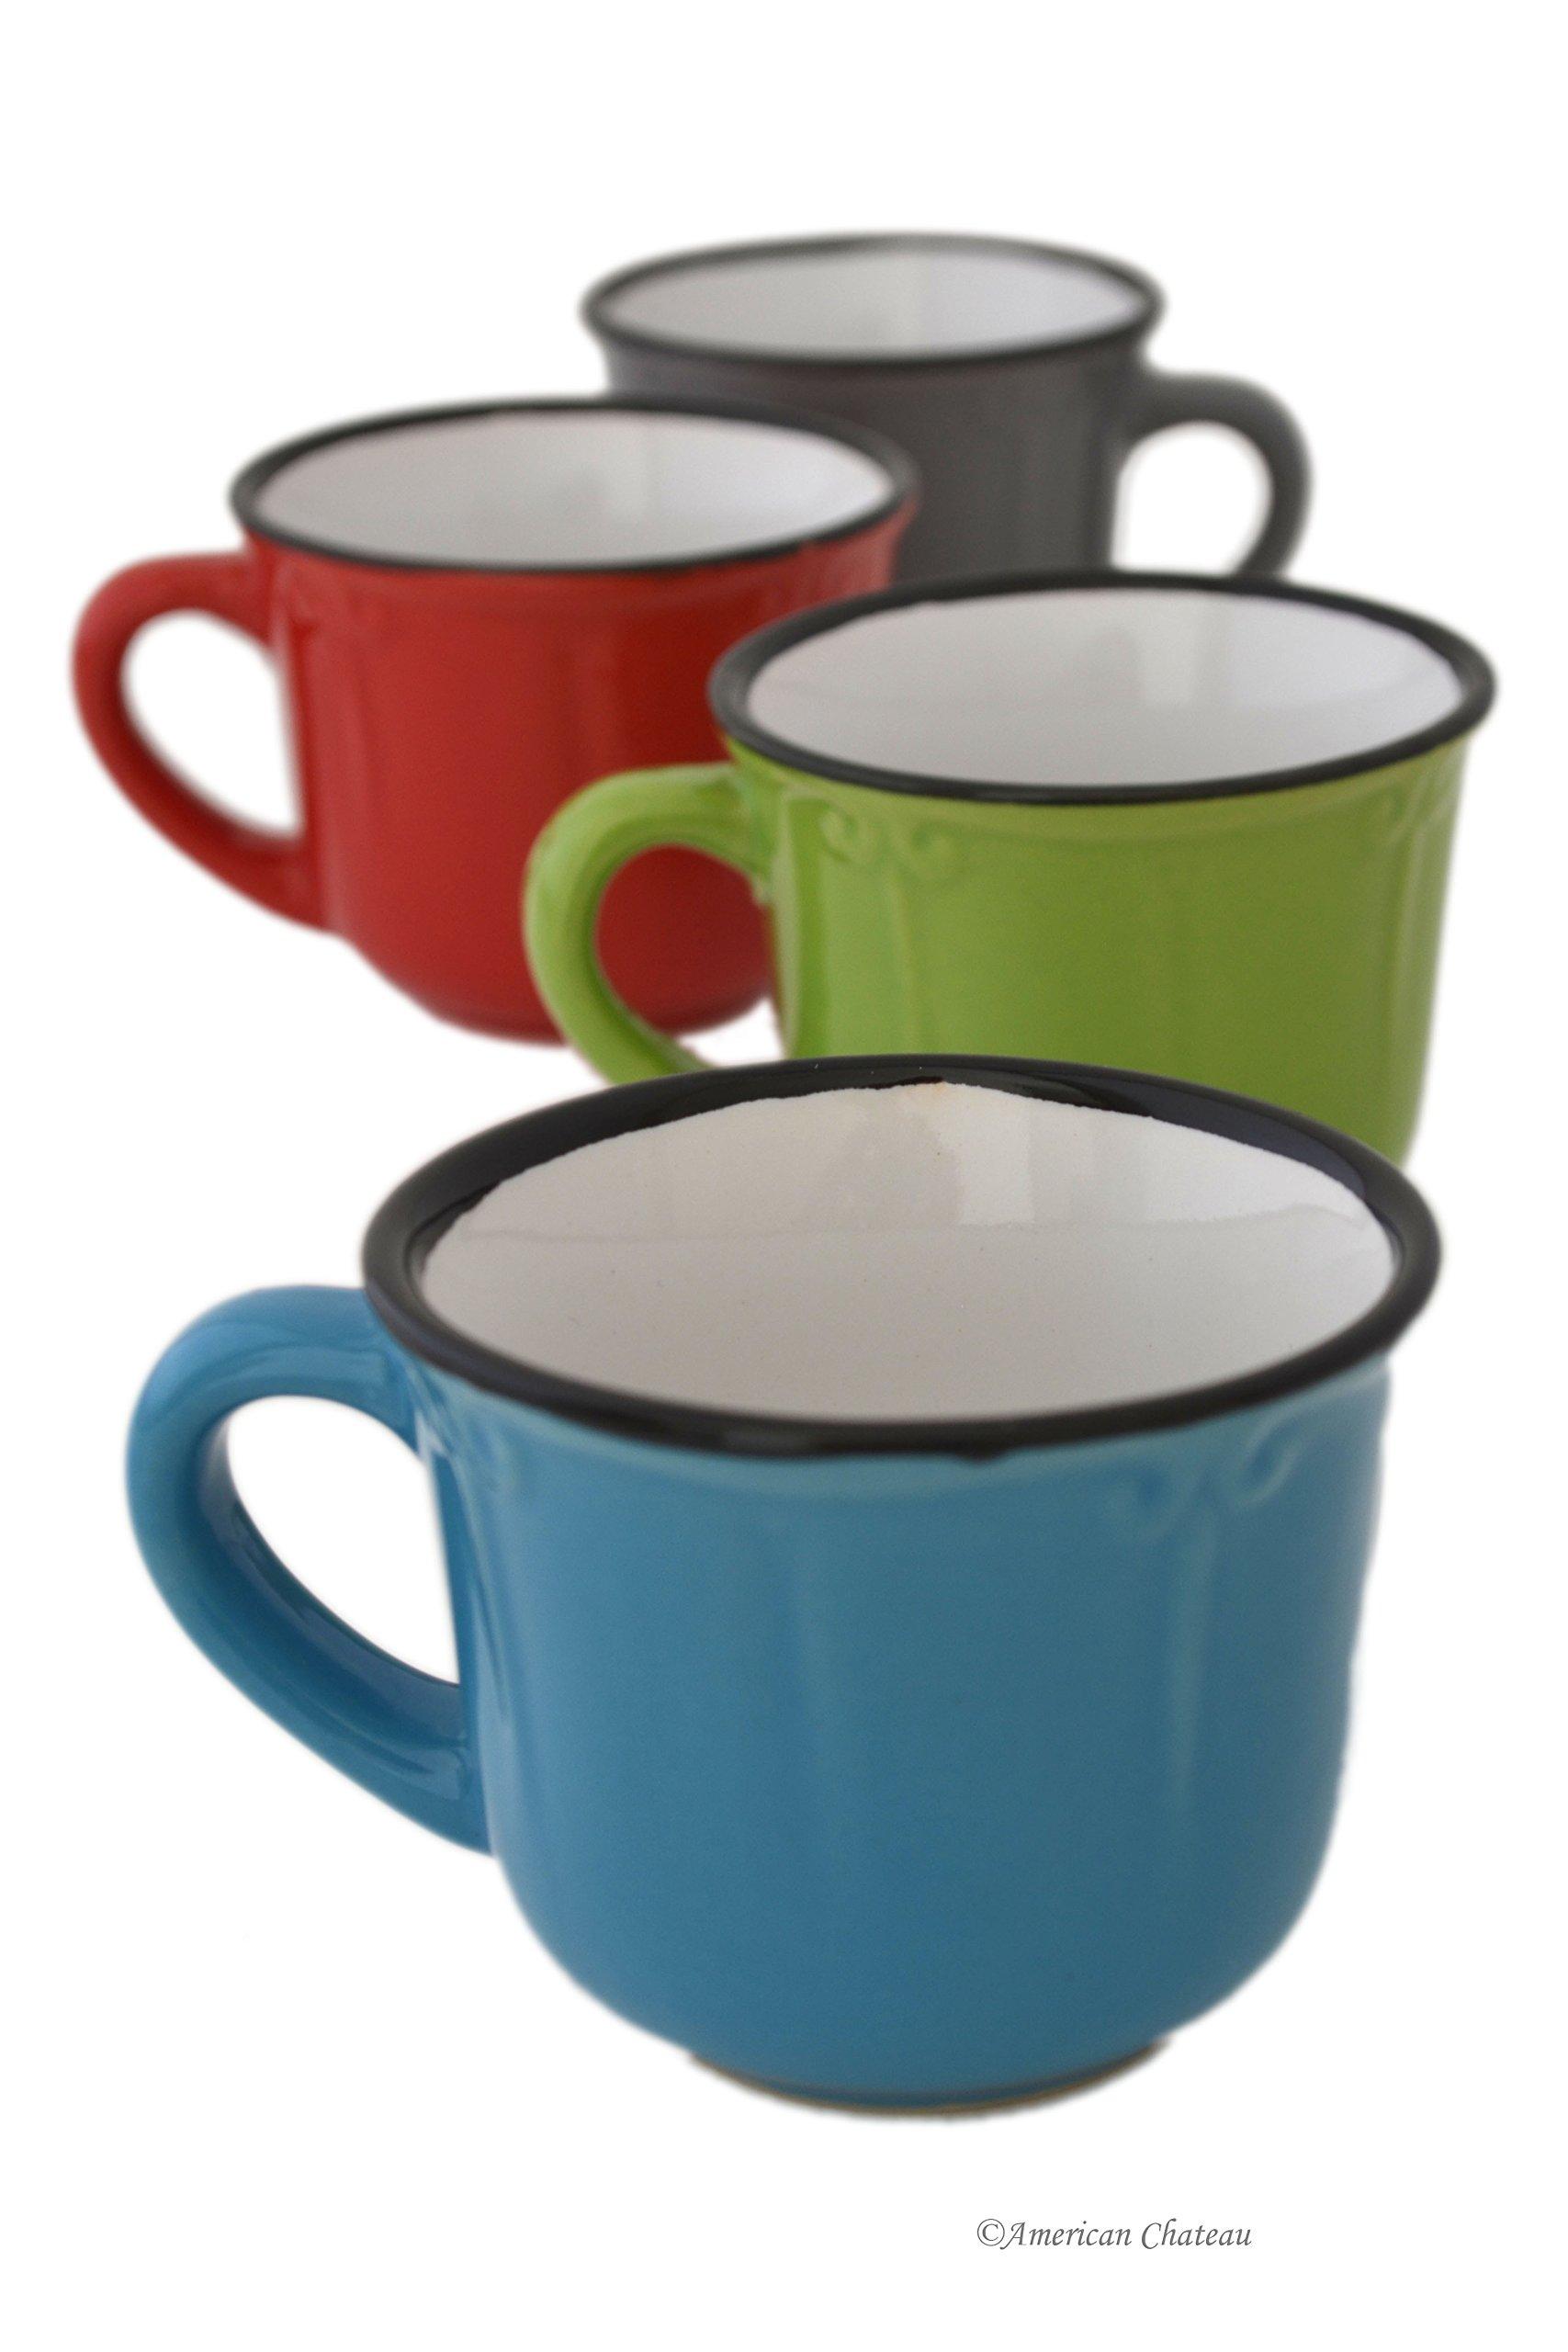 Set 4 Assorted Bright Colors Porcelain 2.5oz Demitasse Espresso Coffee Cups